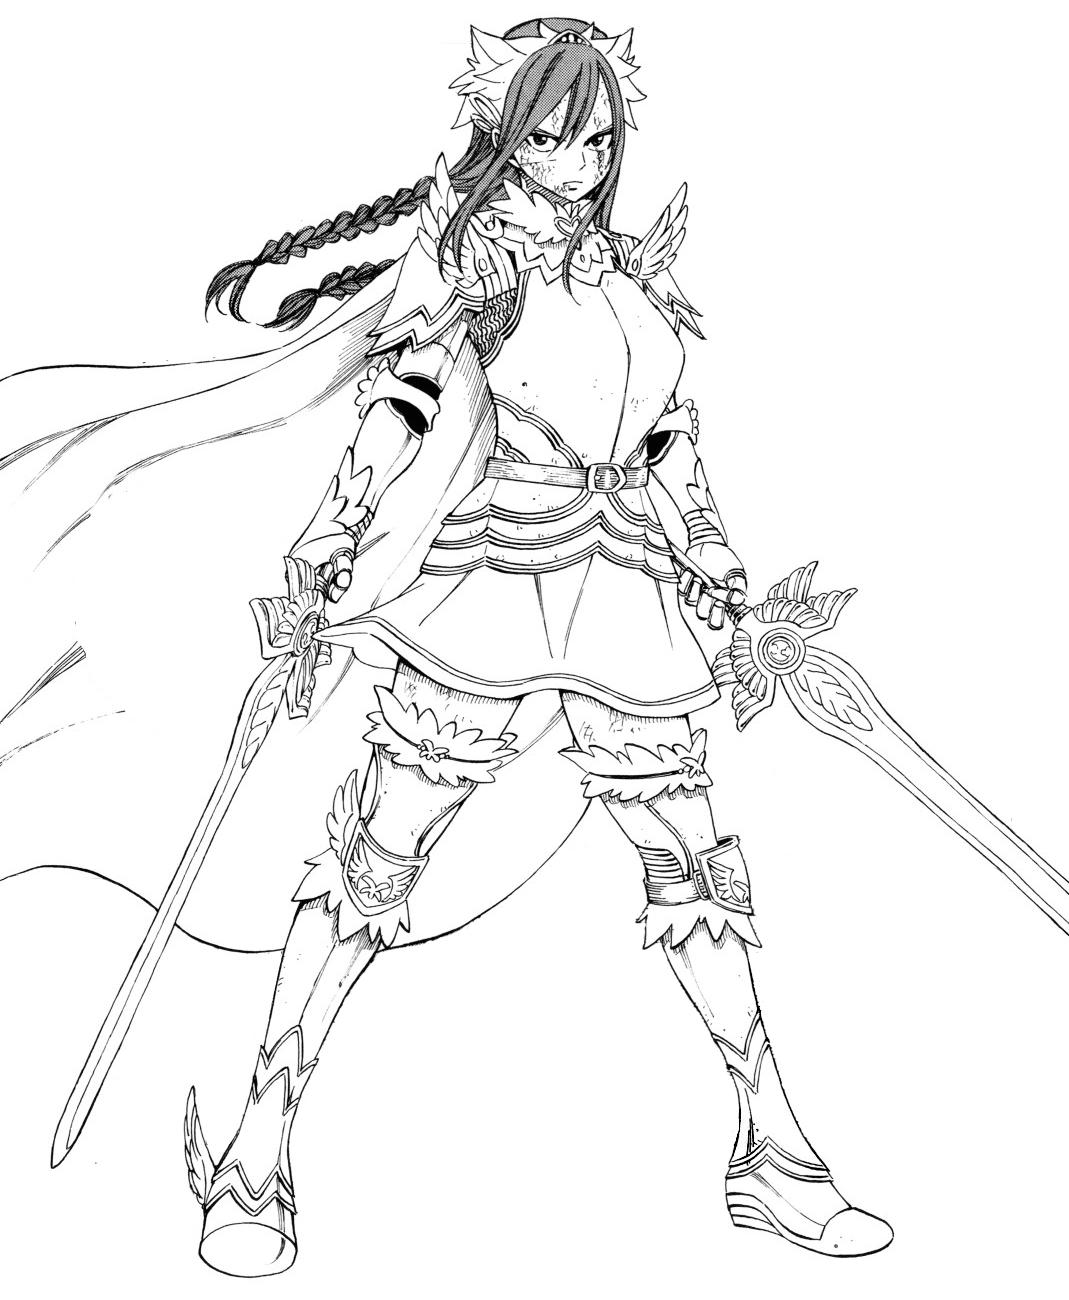 Image - Fairy Armor.jpg | Fairy Tail Wiki | FANDOM powered by Wikia